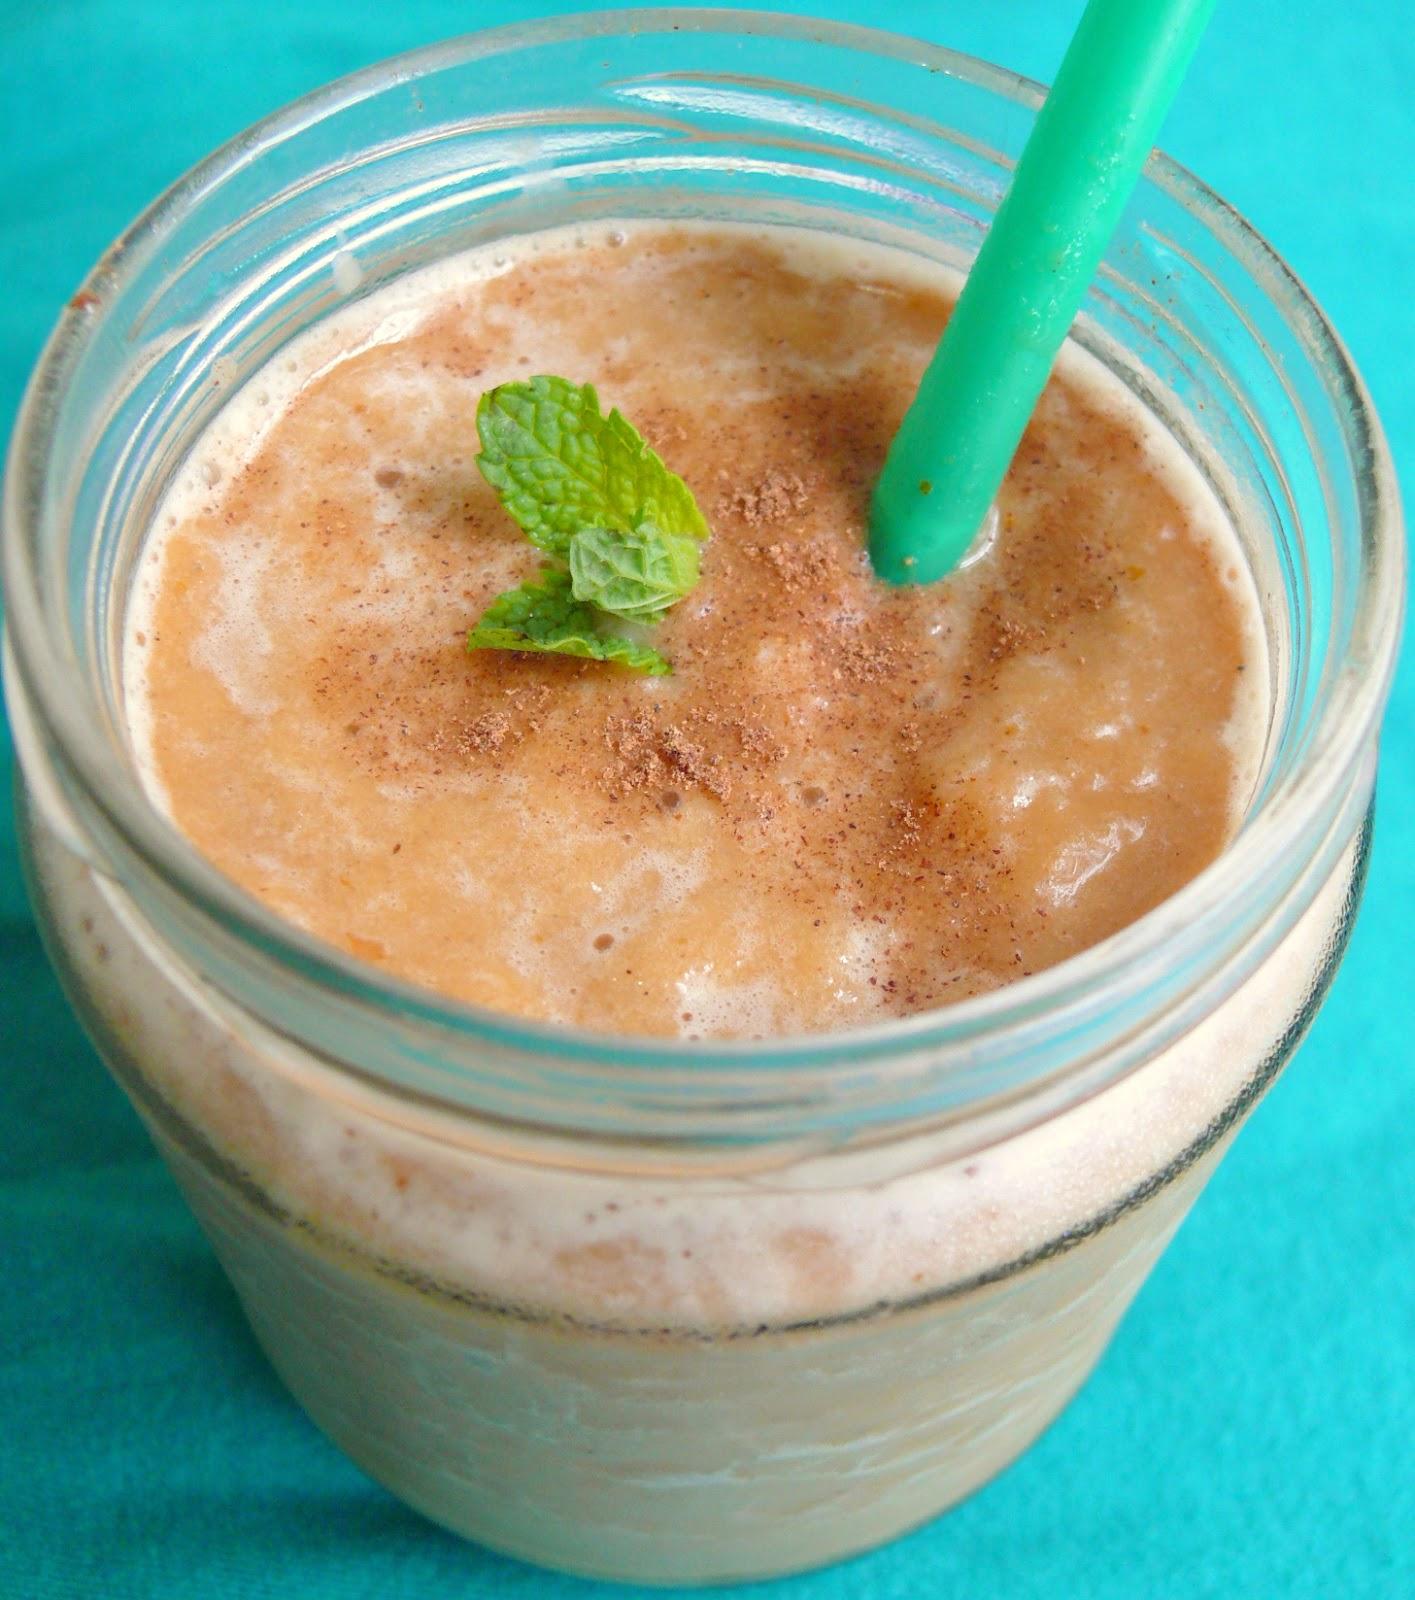 A Life Of Little Pleasures: Iced Vegan Pumpkin Spiced Latte